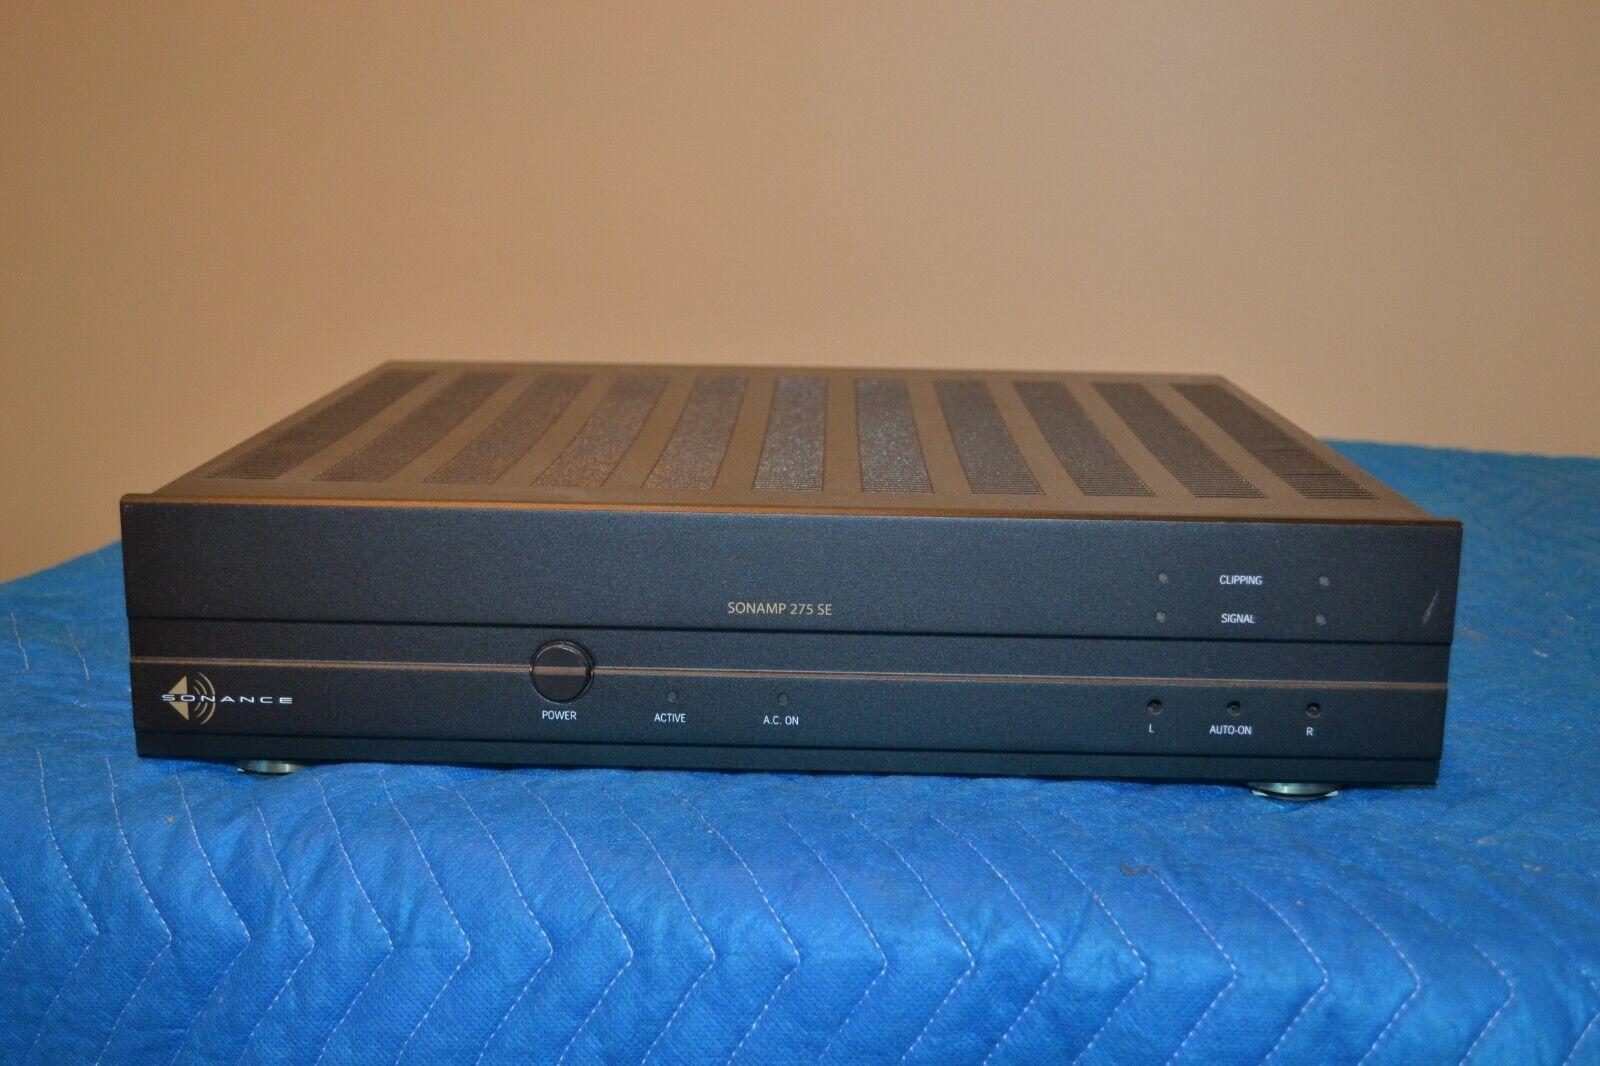 Sonance Sonamp 275 SE Sound Enhanced 2-Channel Stereo Power Amplifie - $134.05